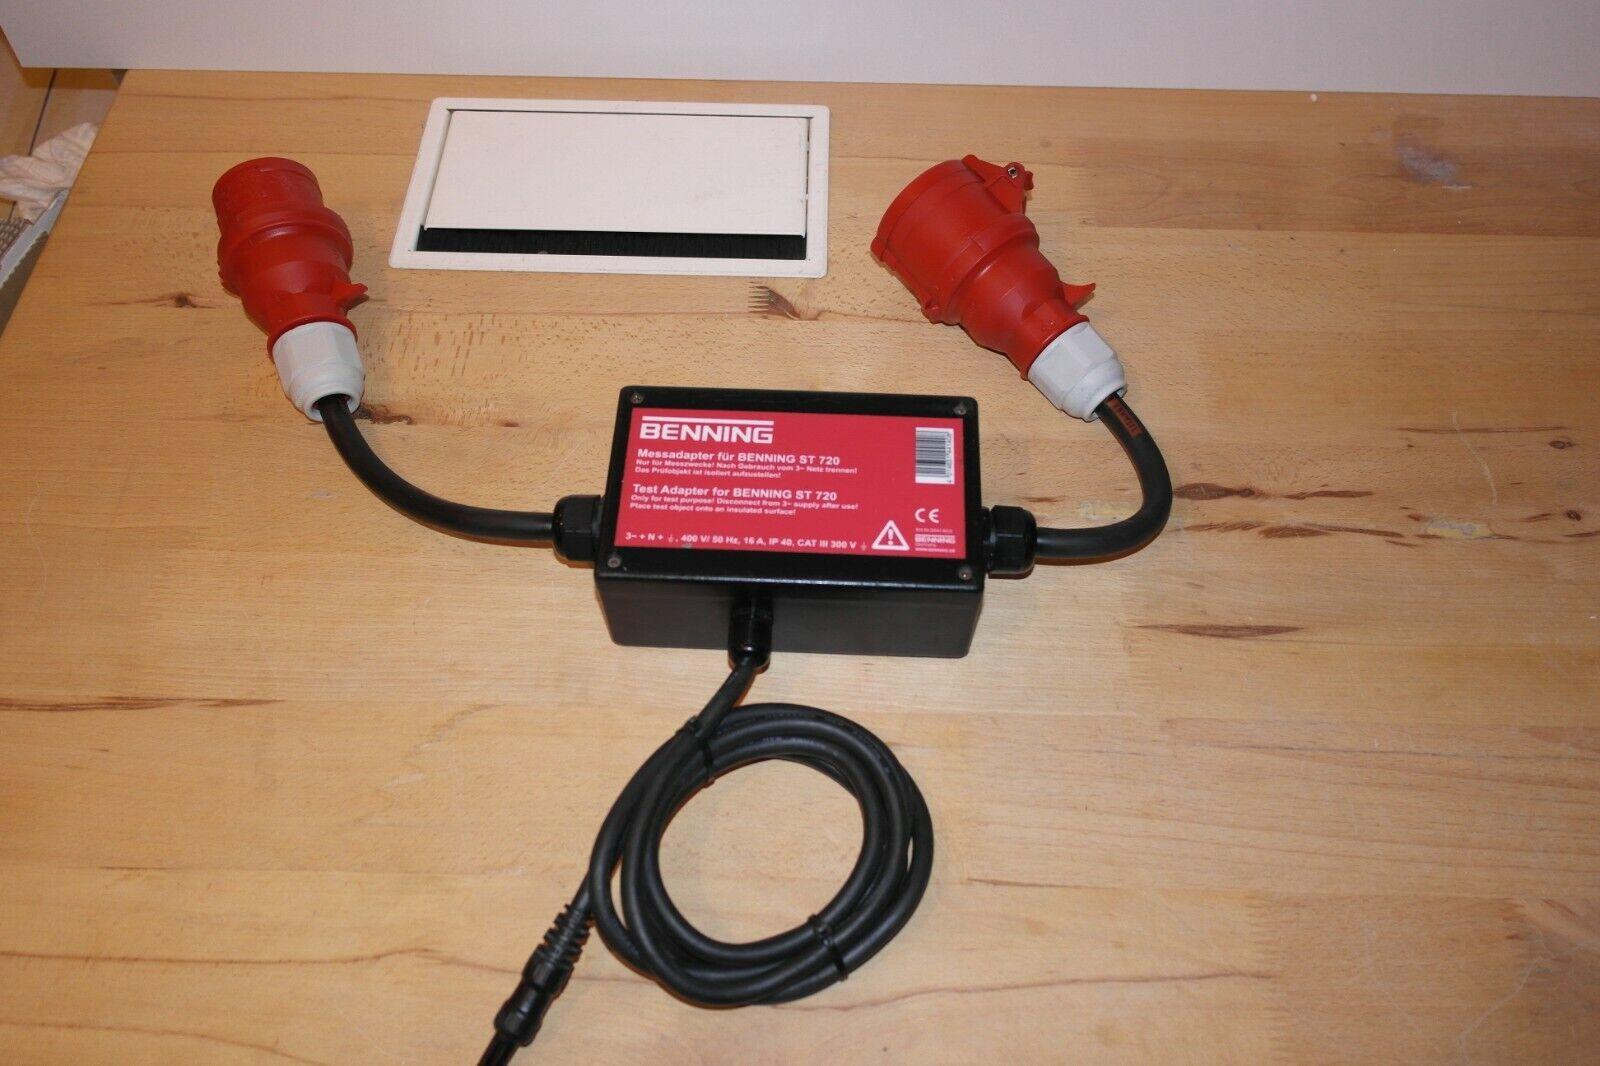 BENNING Messadapter 16 A CEE 5-polig dreiphasige aktiv für Gerätetester 3 phasig